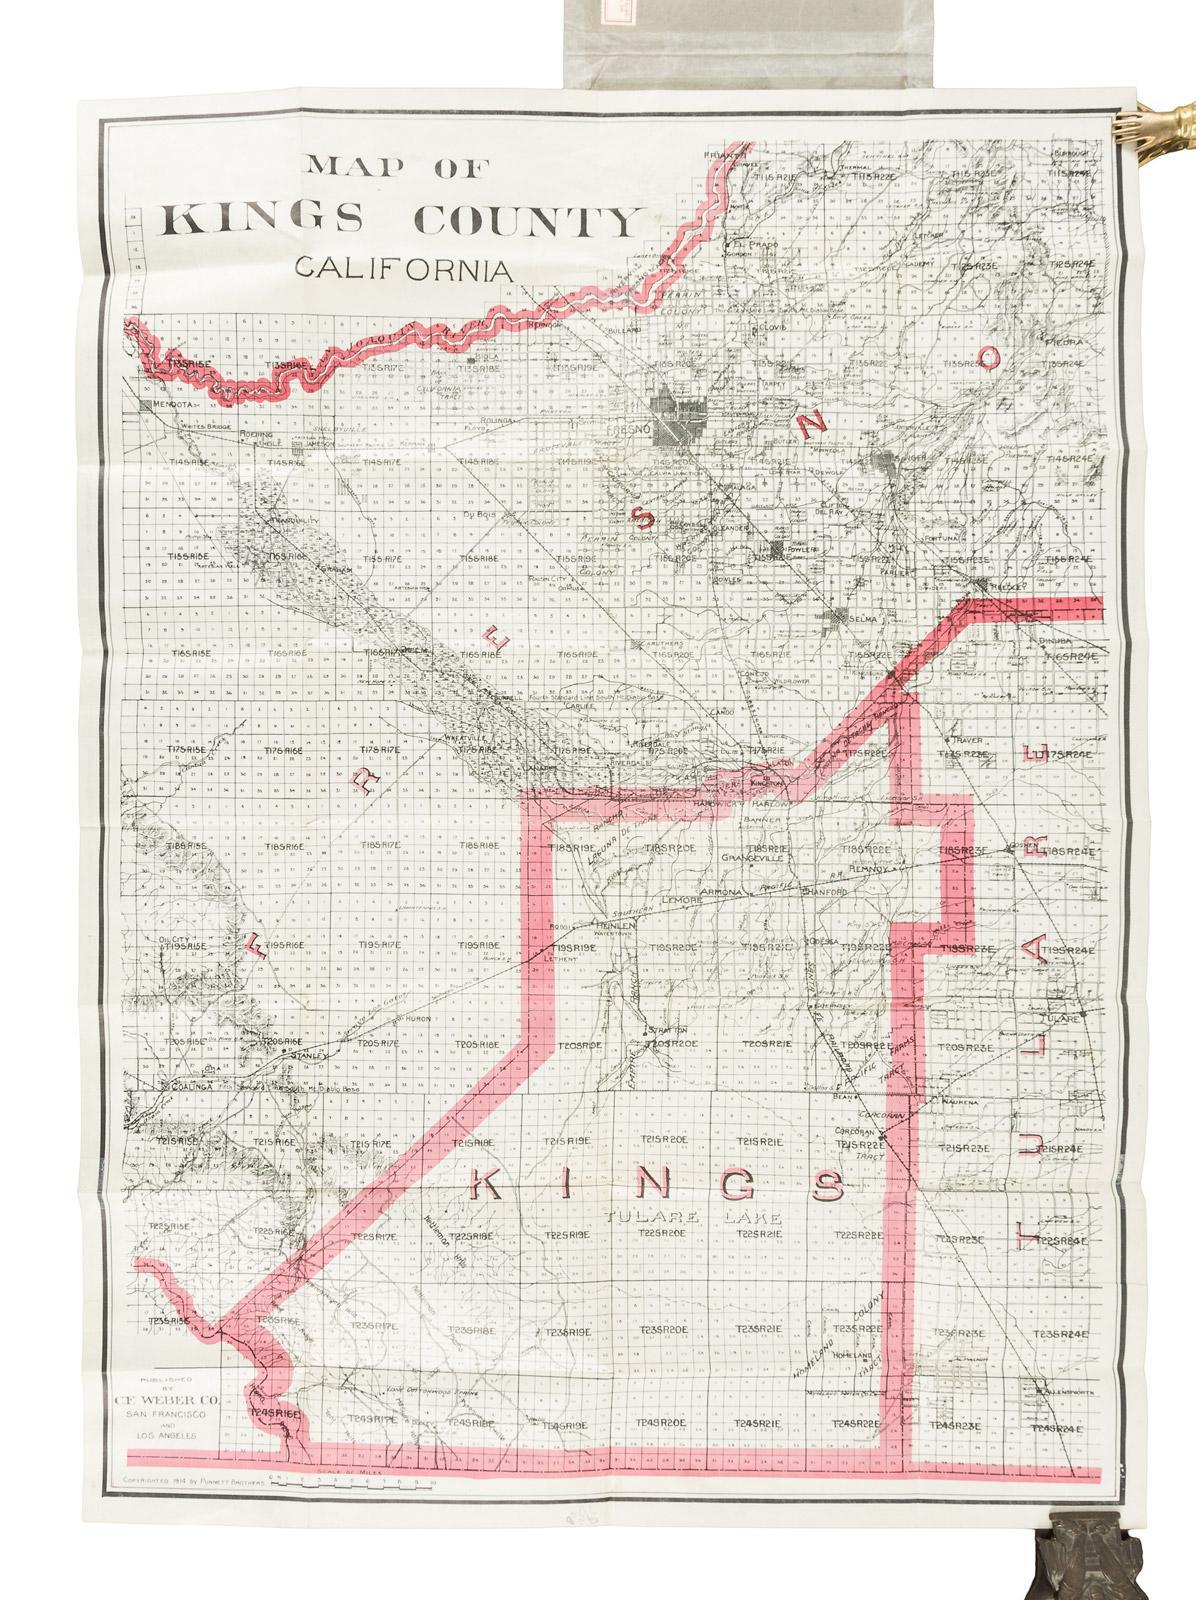 Kings County California Map.Map Of Kings County California Price Estimate 600 900